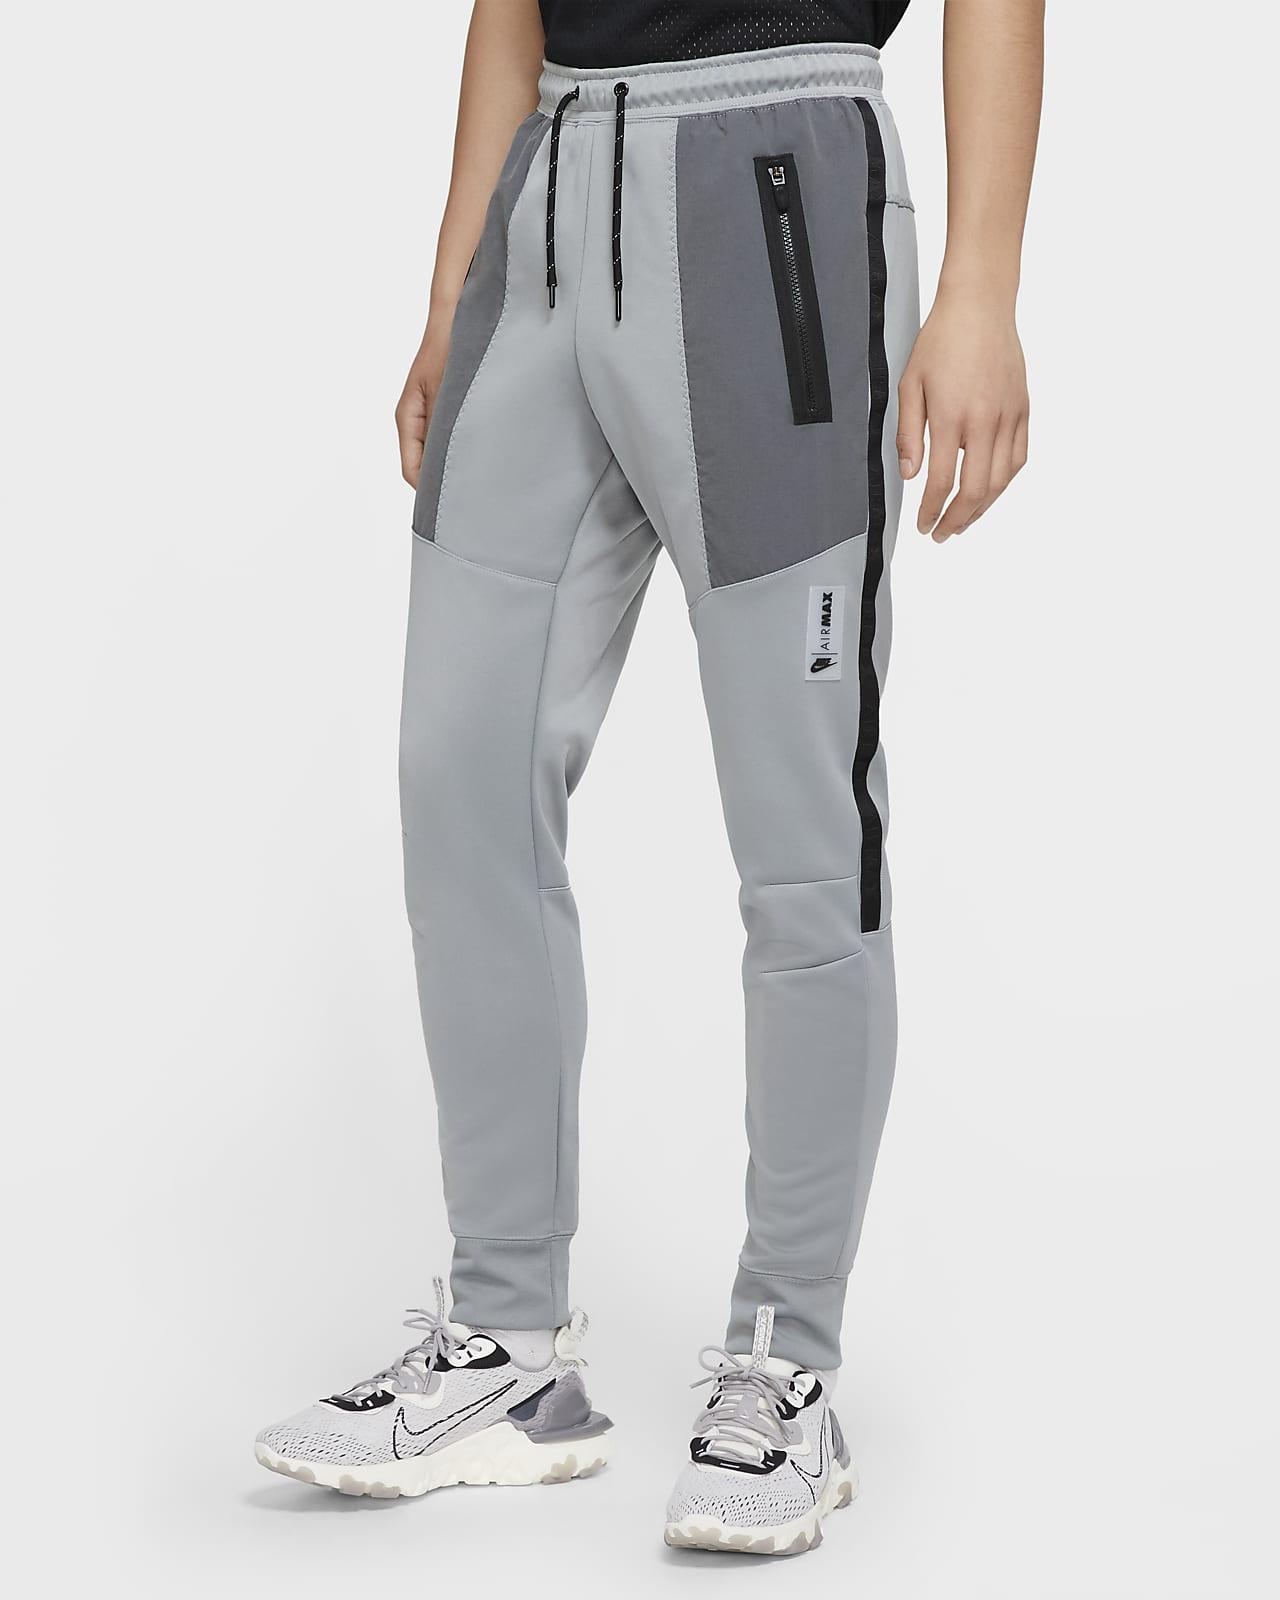 Nike Sportswear Air Max Men's Trousers